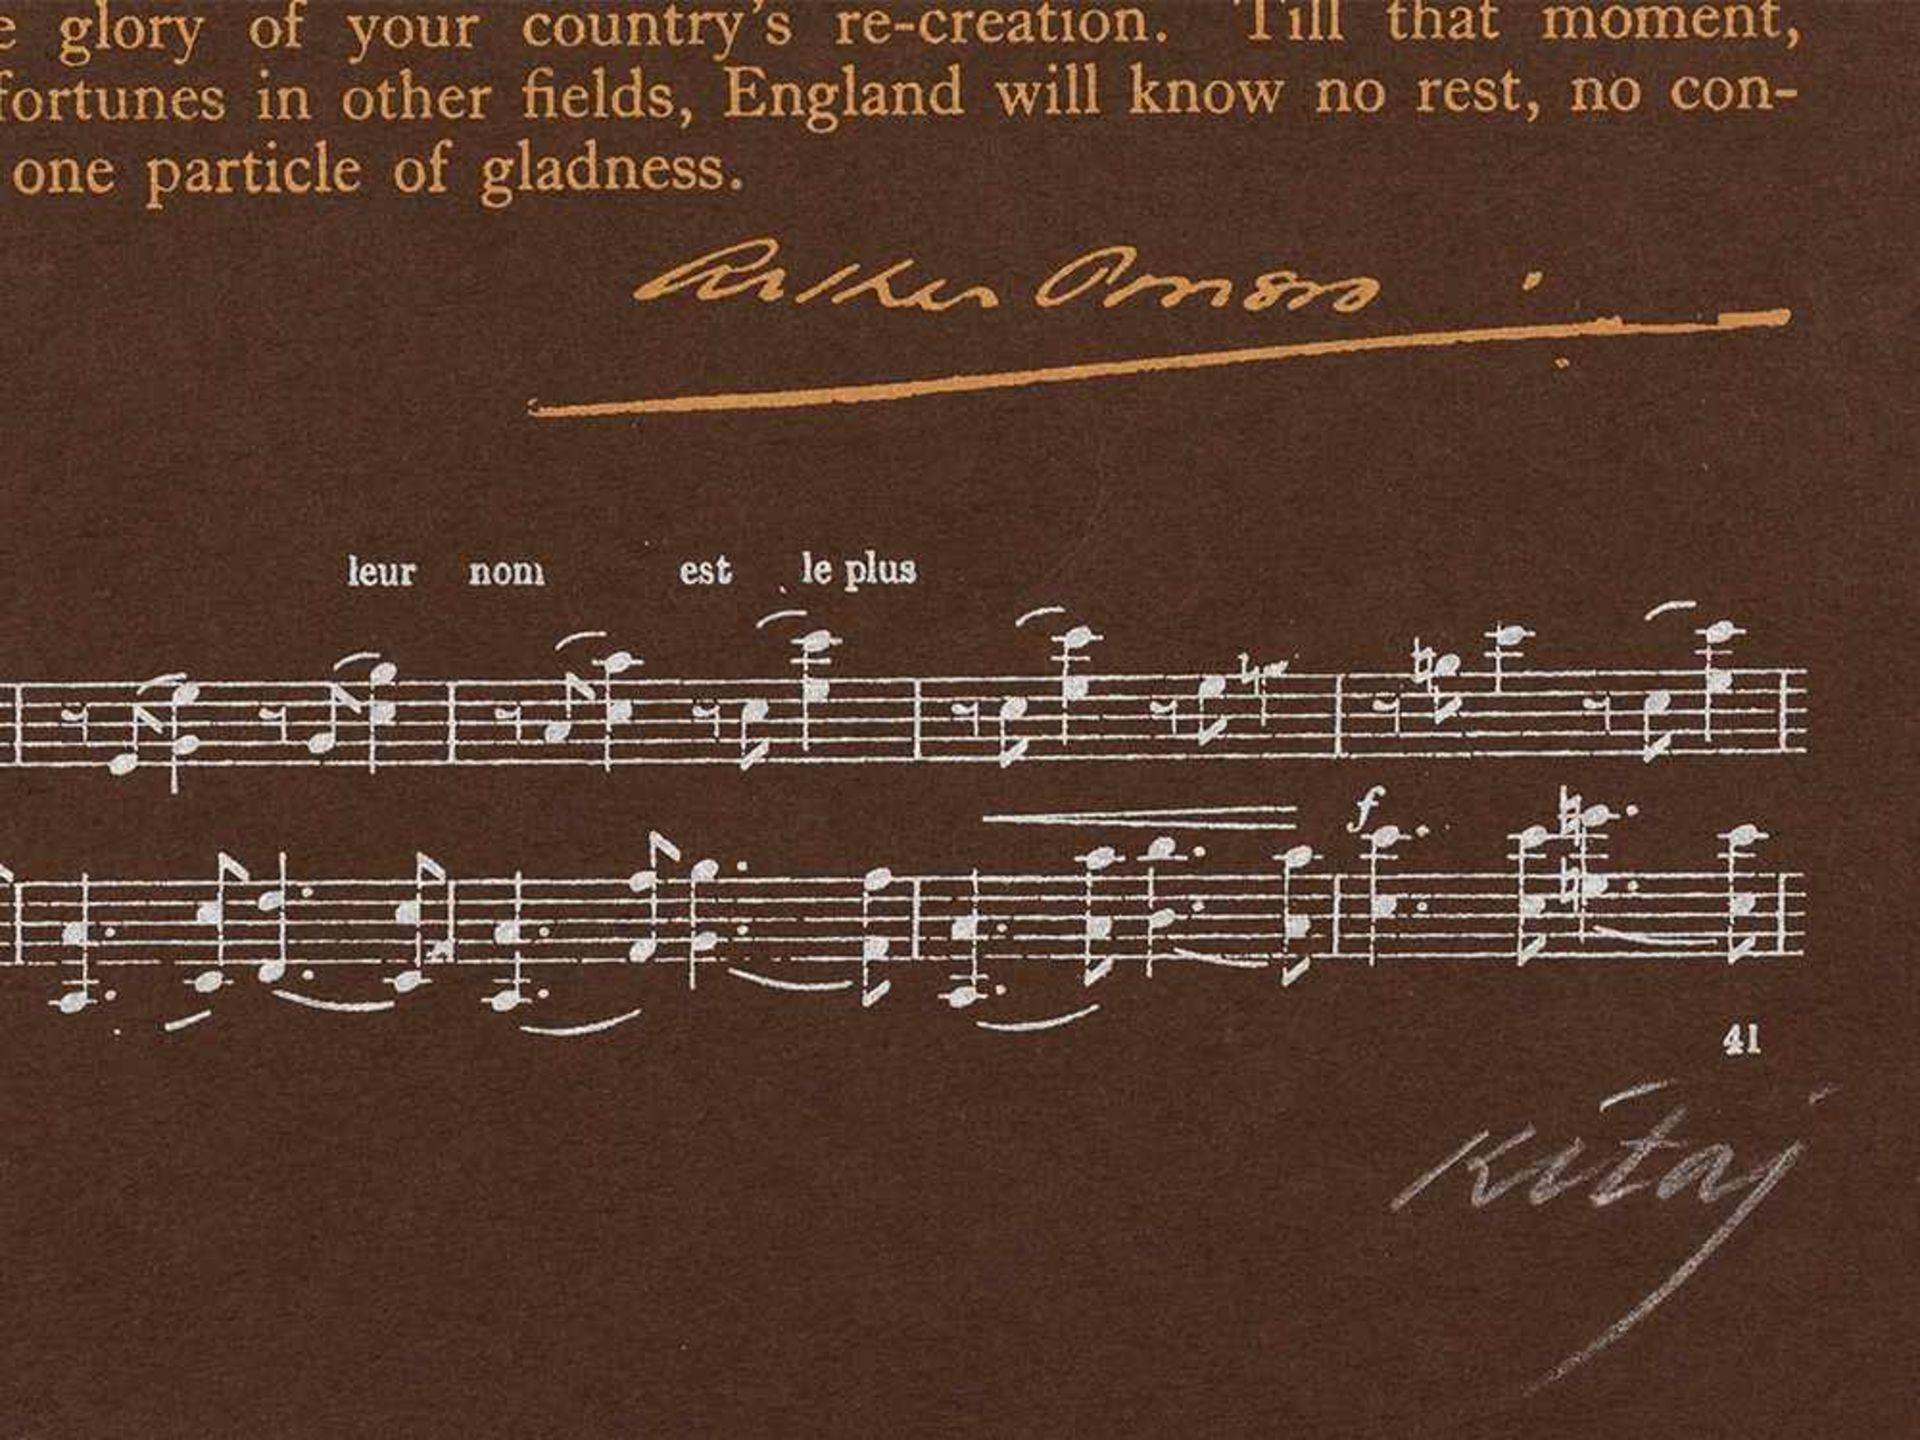 Los 76 - R. B. Kitaj, Heart, Farbserigrafie, 1966 Farbserigrafie auf braunem Velin. Großbritannien, 1966.